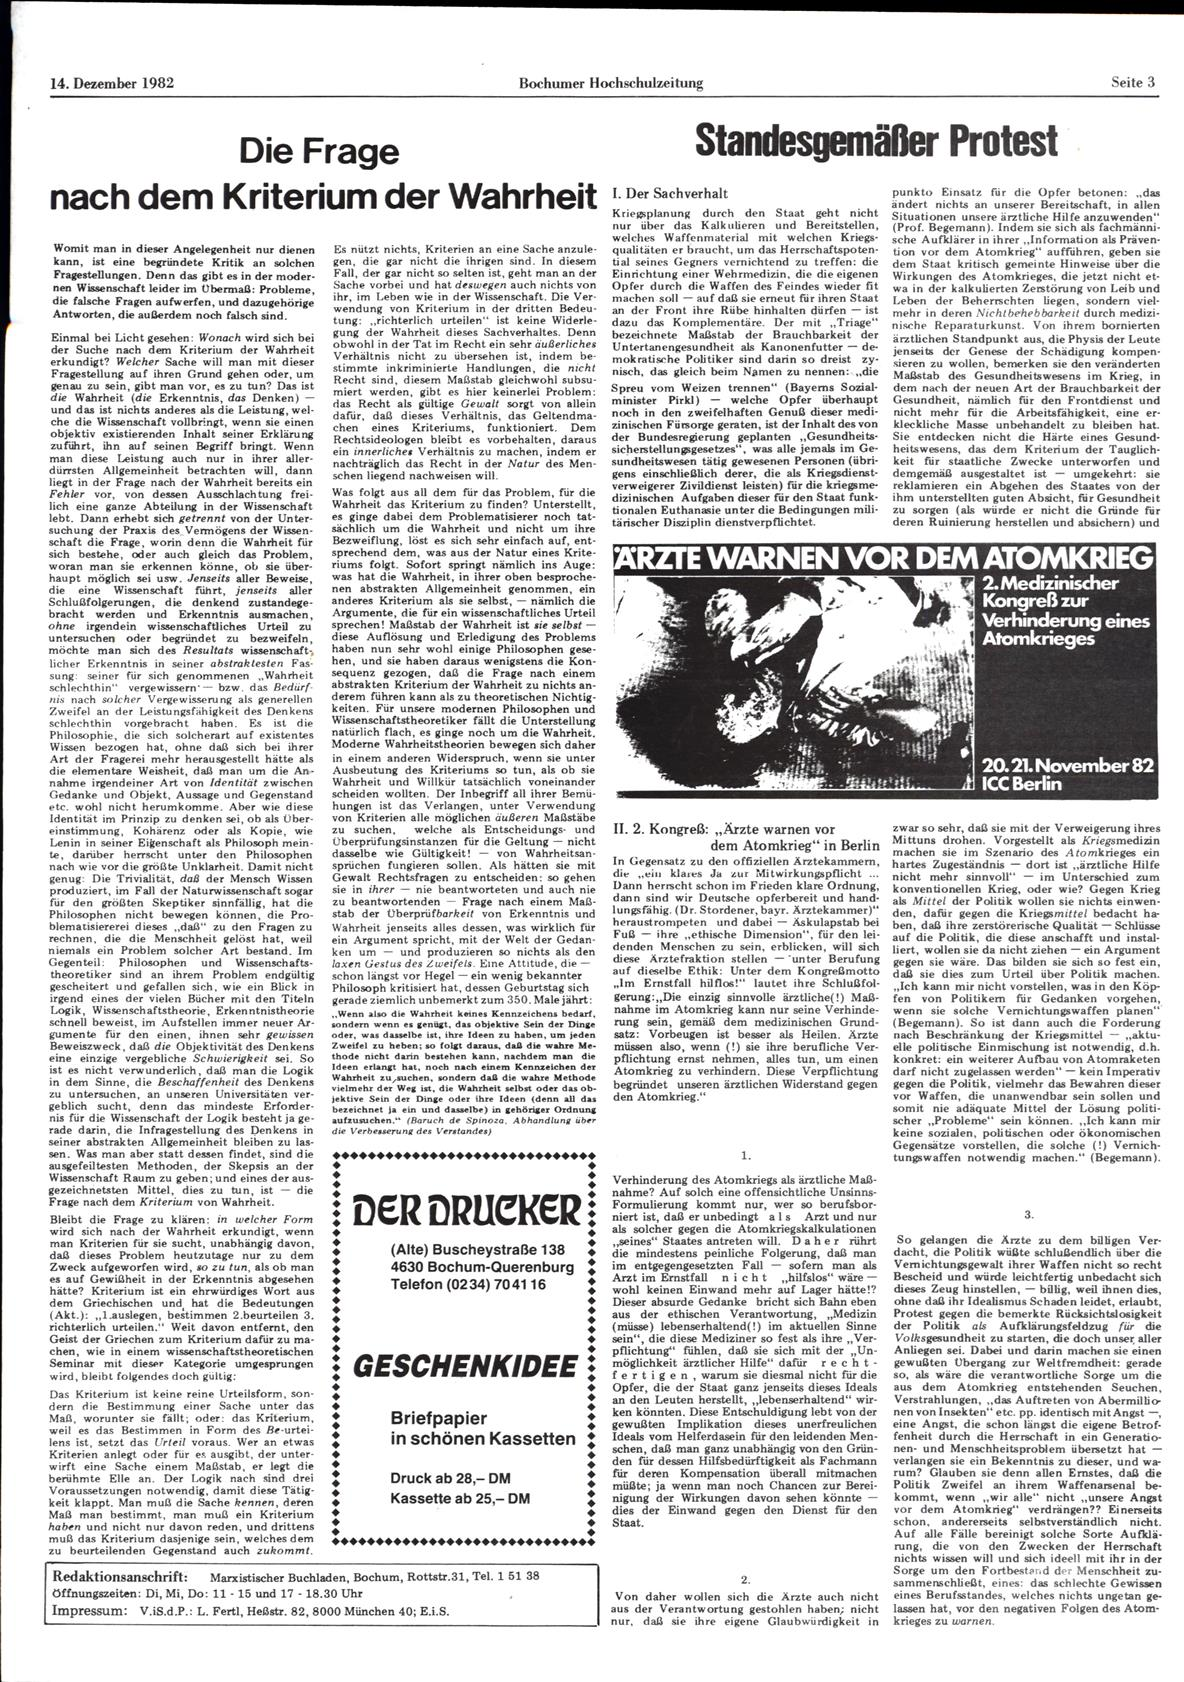 Bochum_BHZ_19821214_062_003